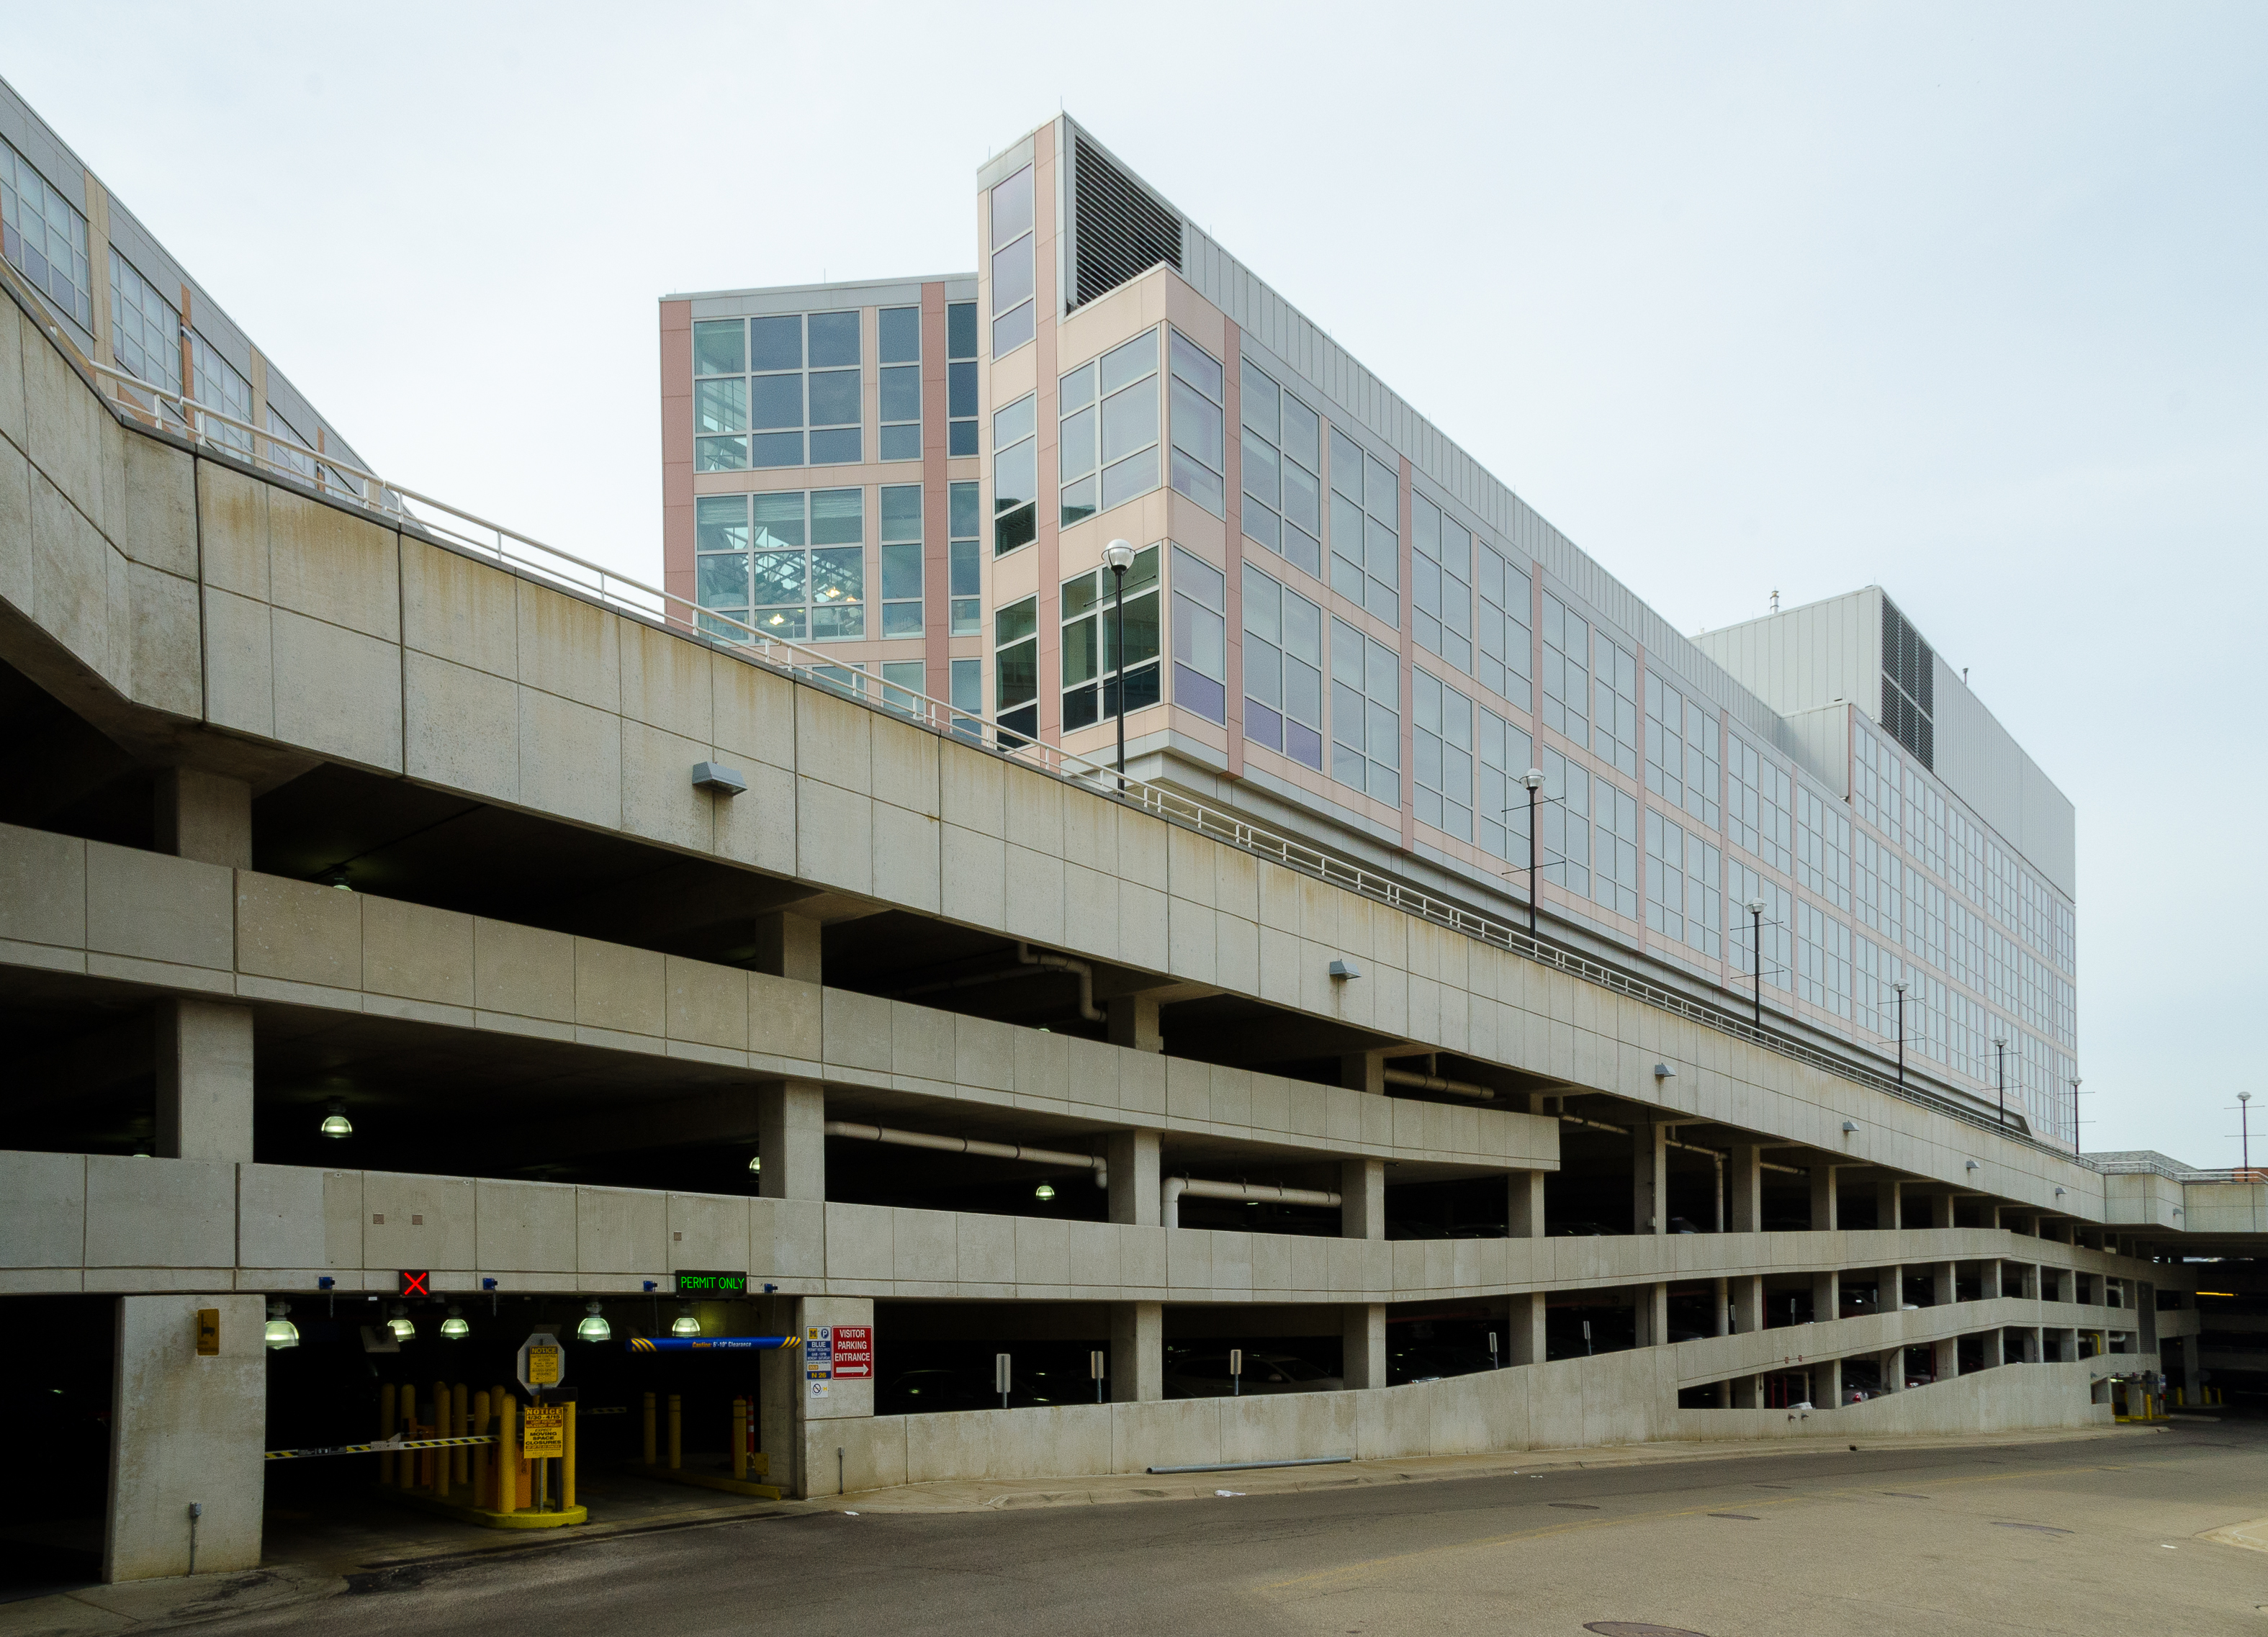 Parking Structure Photo